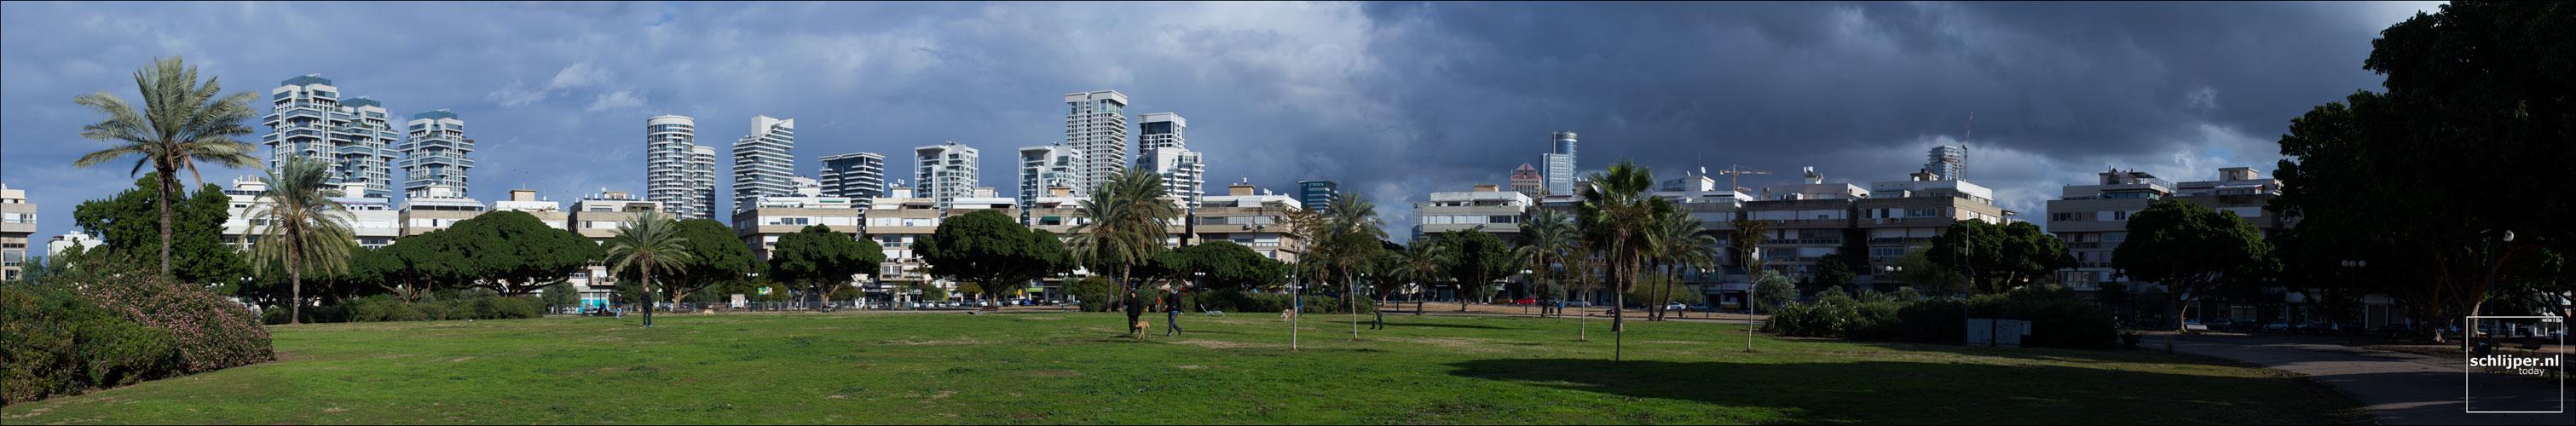 Israel, Tel Aviv, 2 januari 2016